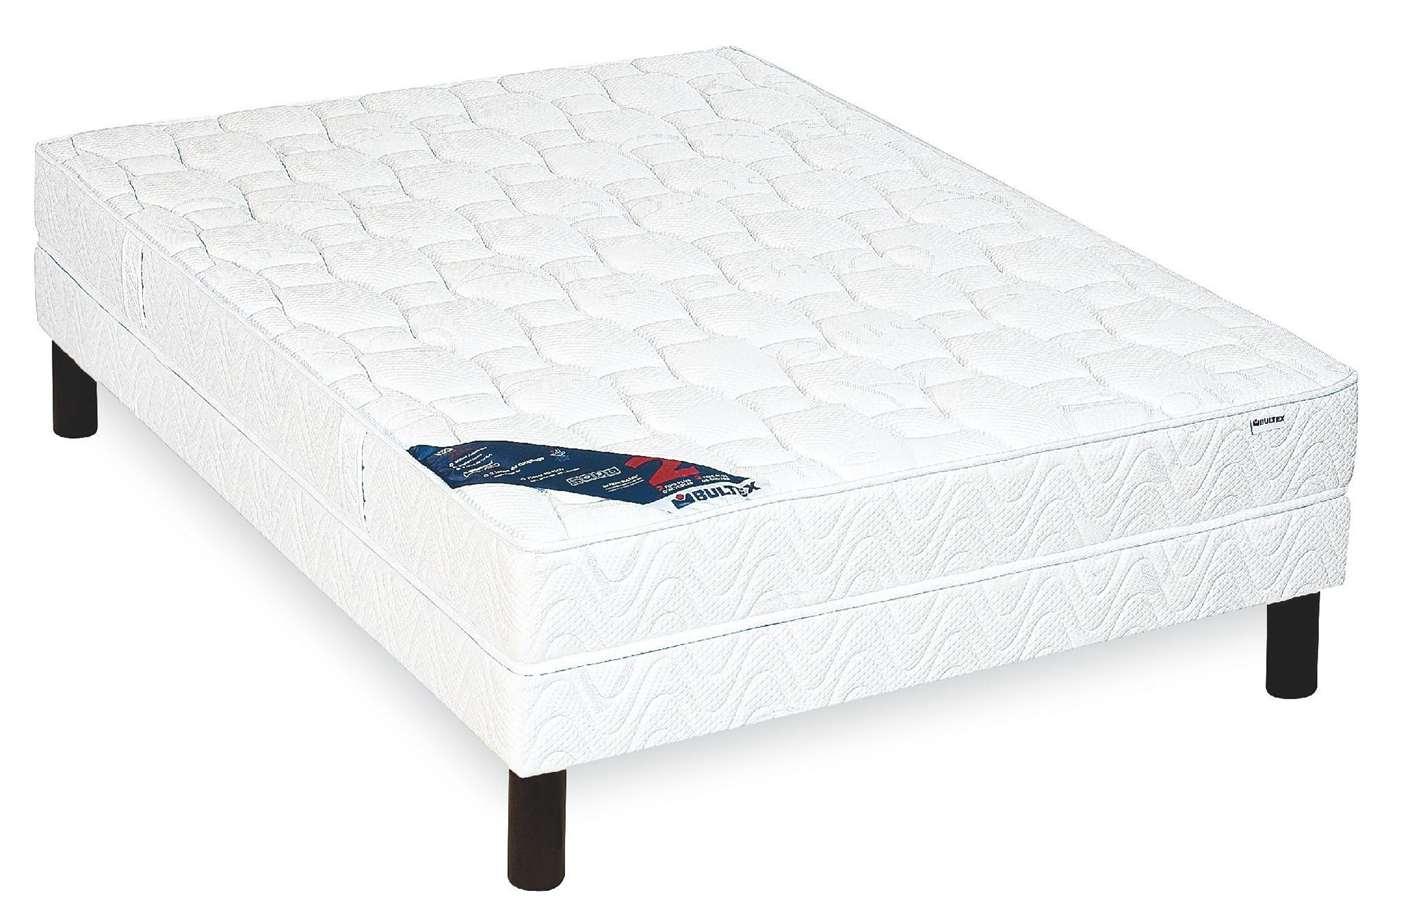 bultex cmatelas reflet 160 x 200. Black Bedroom Furniture Sets. Home Design Ideas